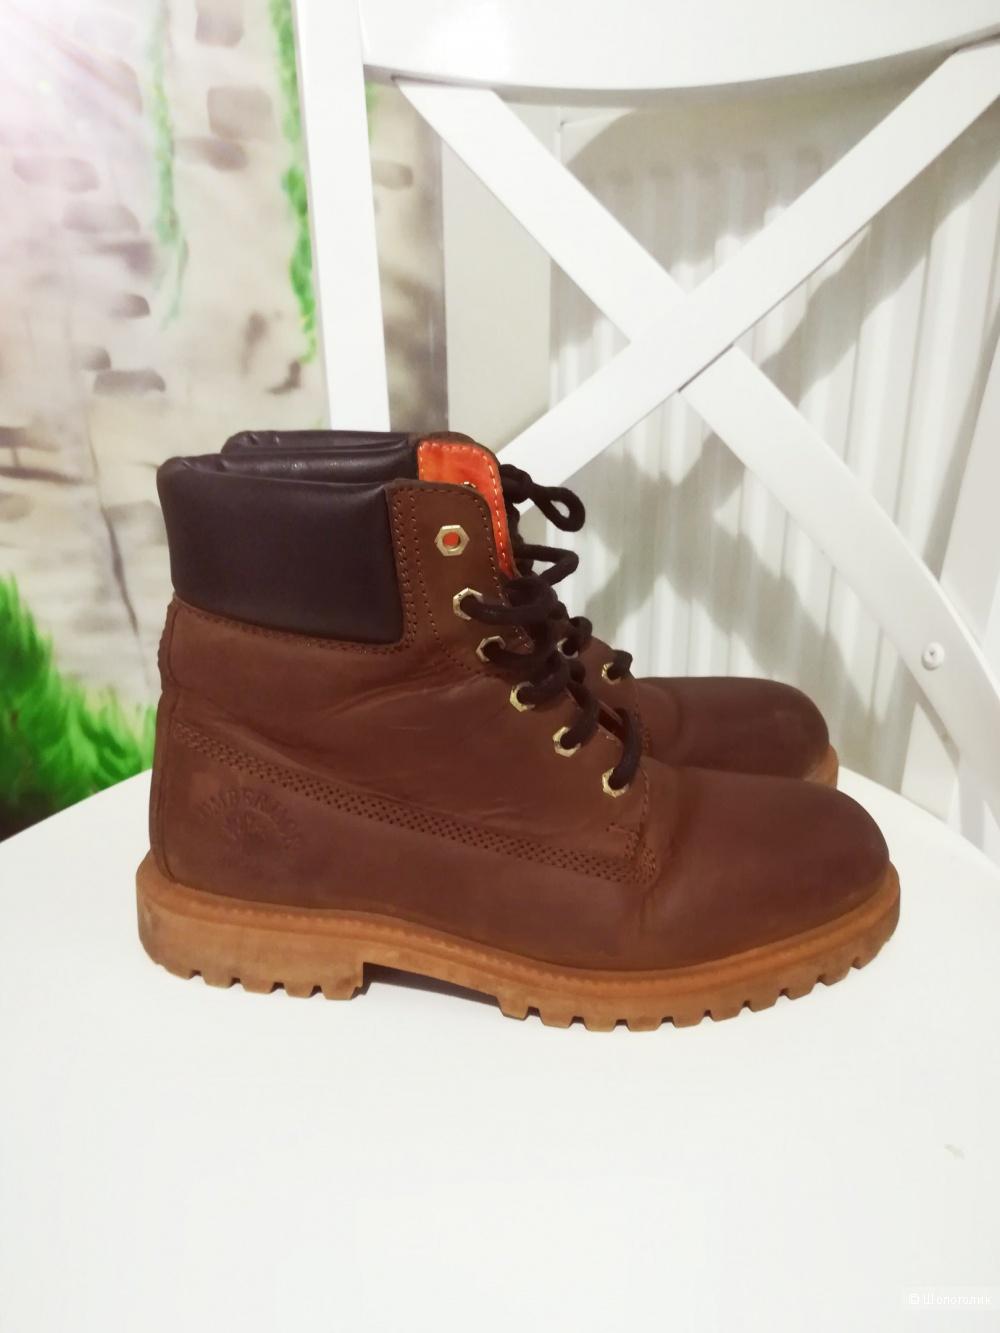 Ботинки Lumber jack,размер 38